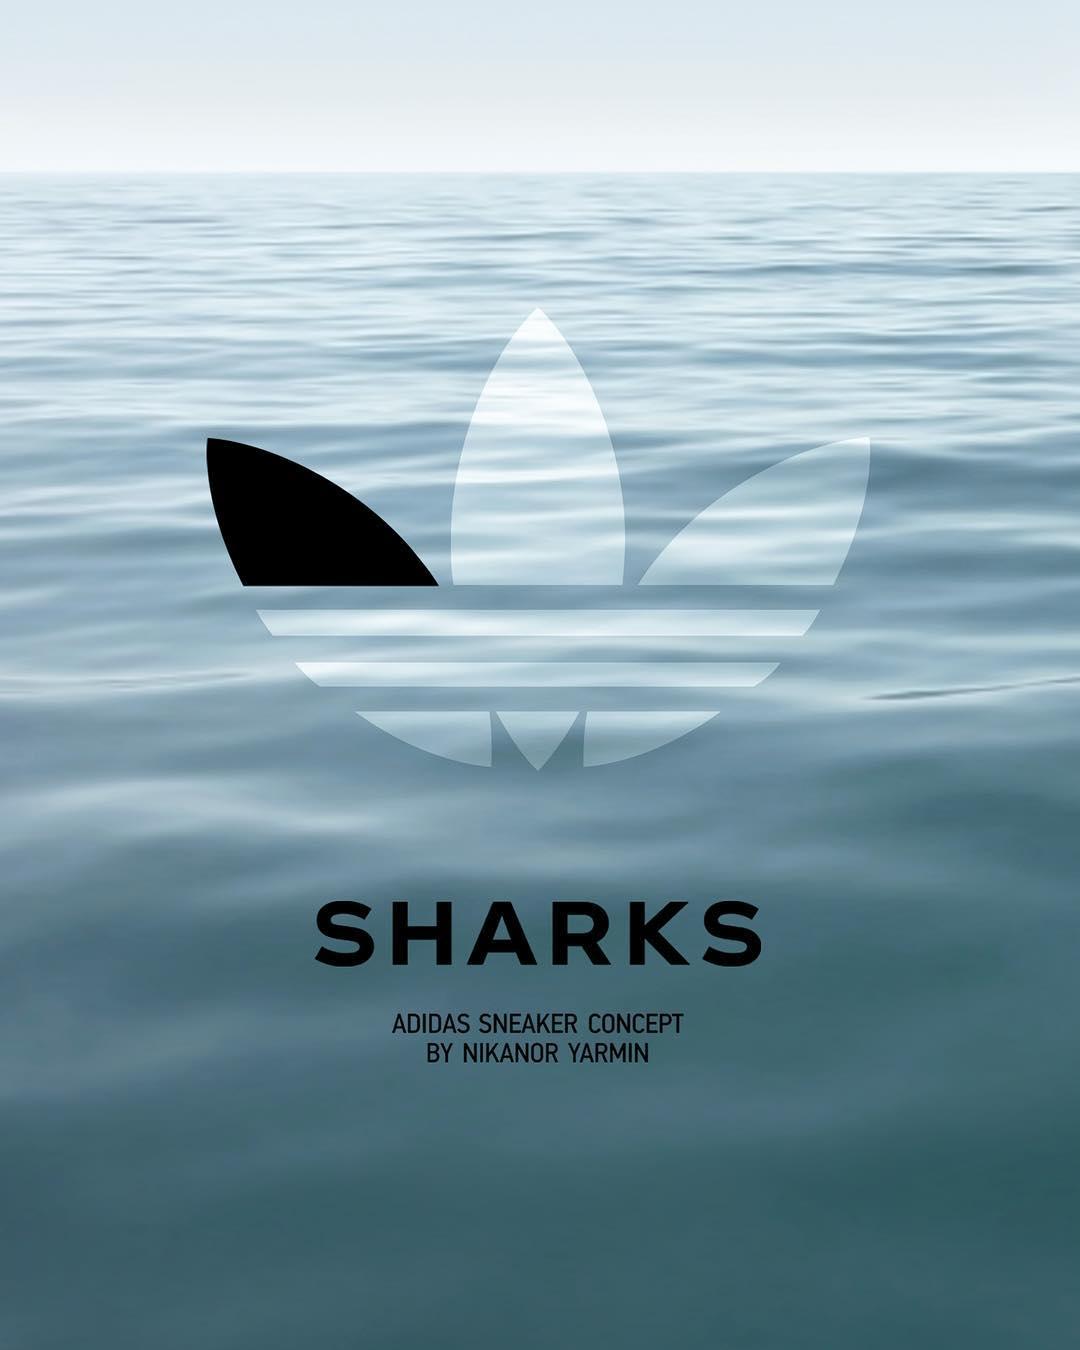 adidas sharks nikanor yarmin